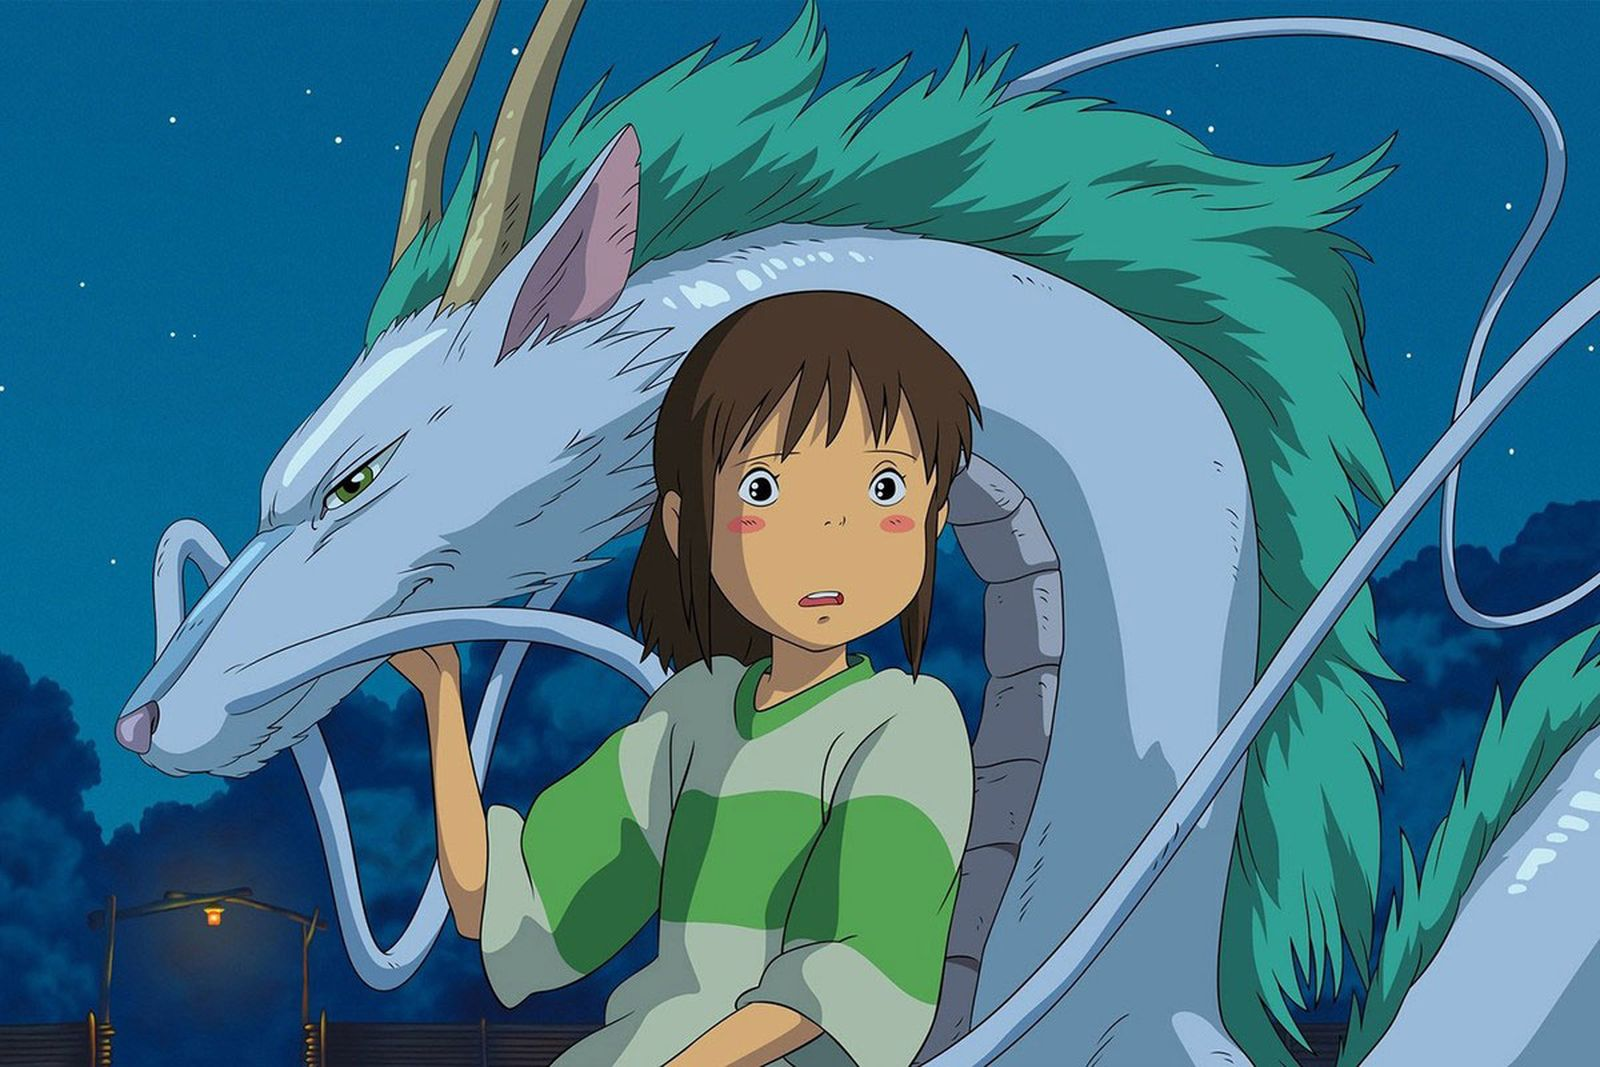 Studio Ghibli 'Spirited Away' film still